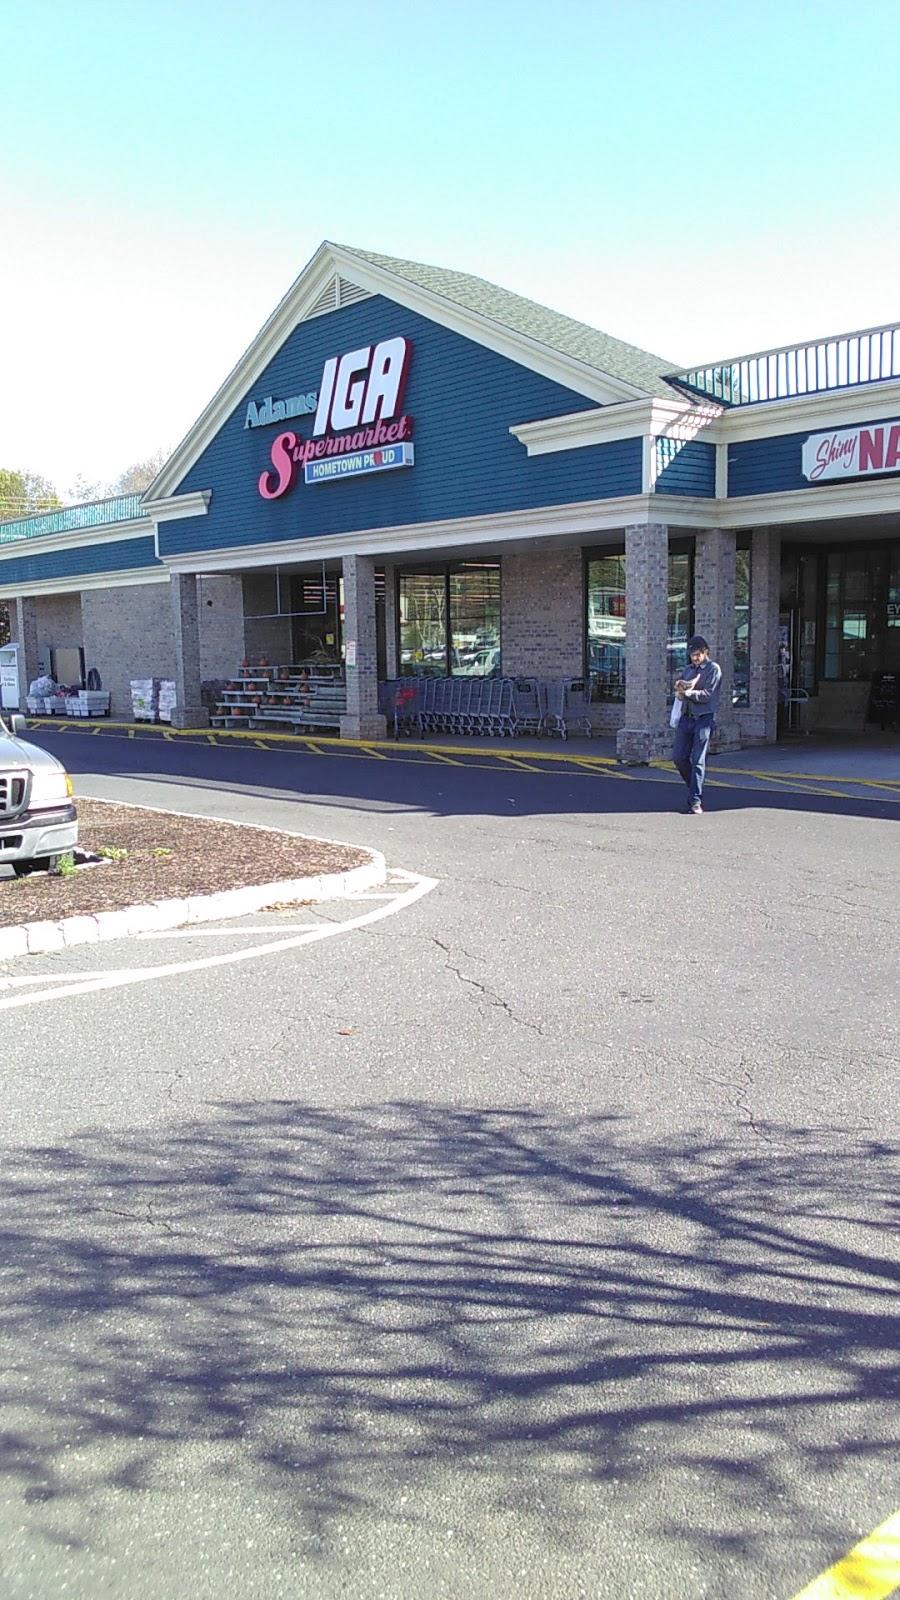 Adams Hometown Market - store  | Photo 5 of 7 | Address: 311 Main St, Terryville, CT 06786, USA | Phone: (860) 583-9177